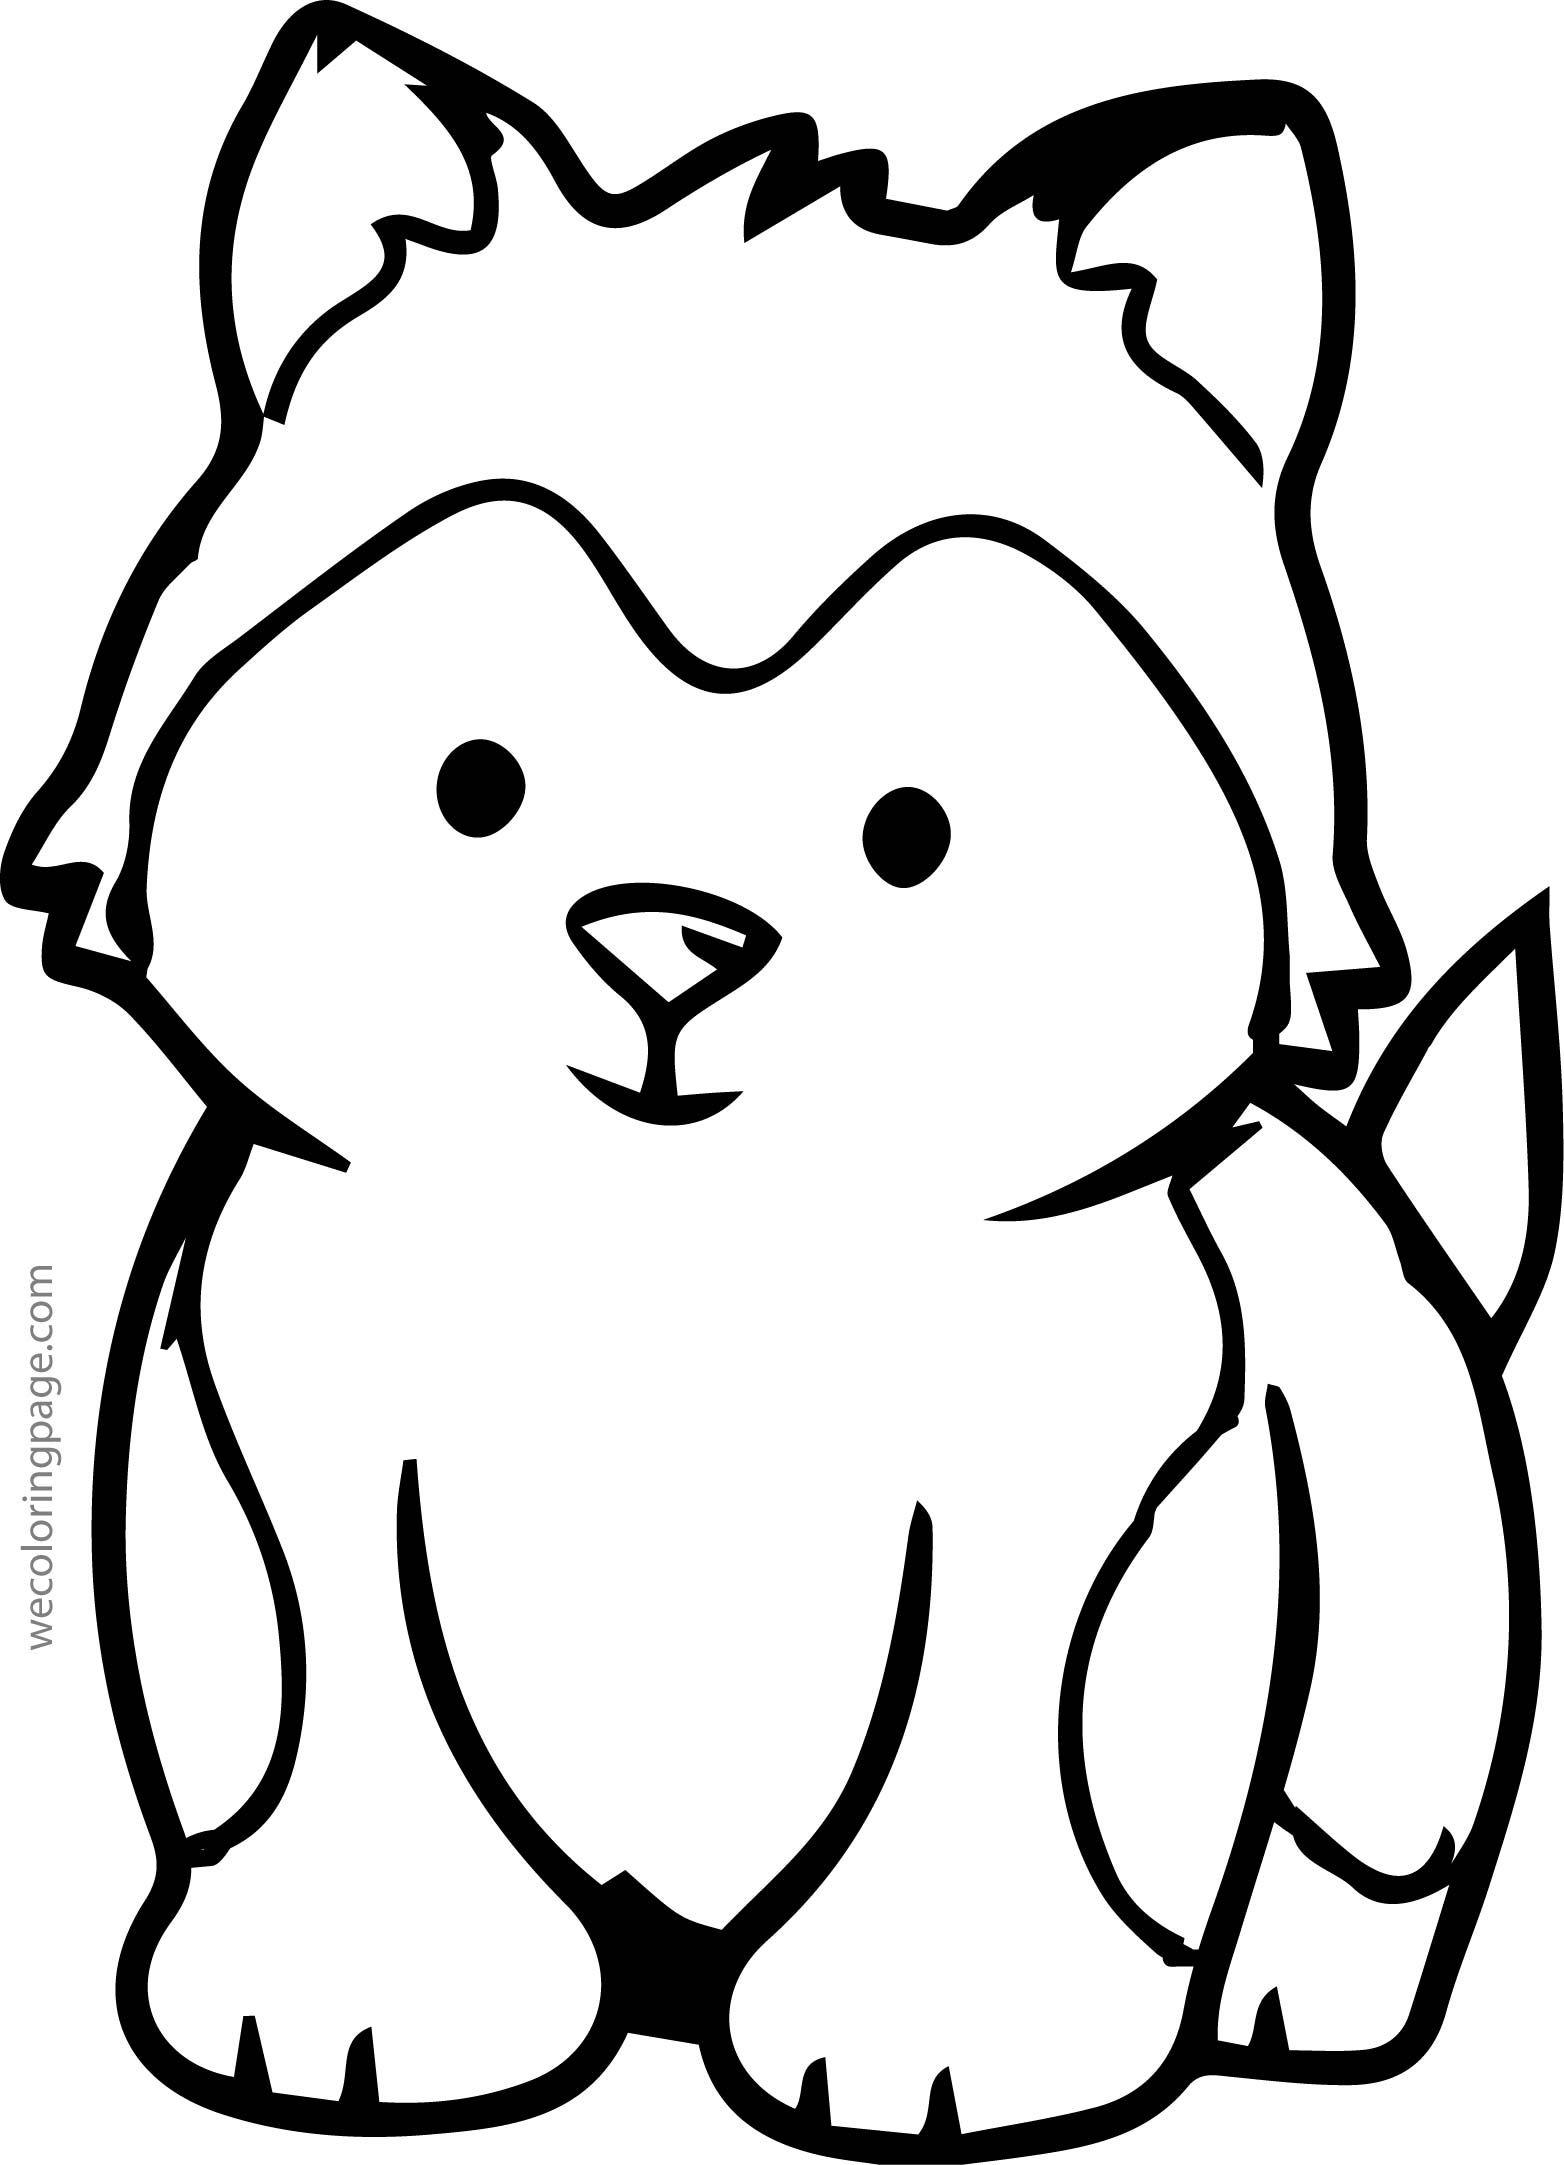 Cool Husky Baby Coloring Page Farm Animal Coloring Pages Dog Coloring Page Puppy Coloring Pages